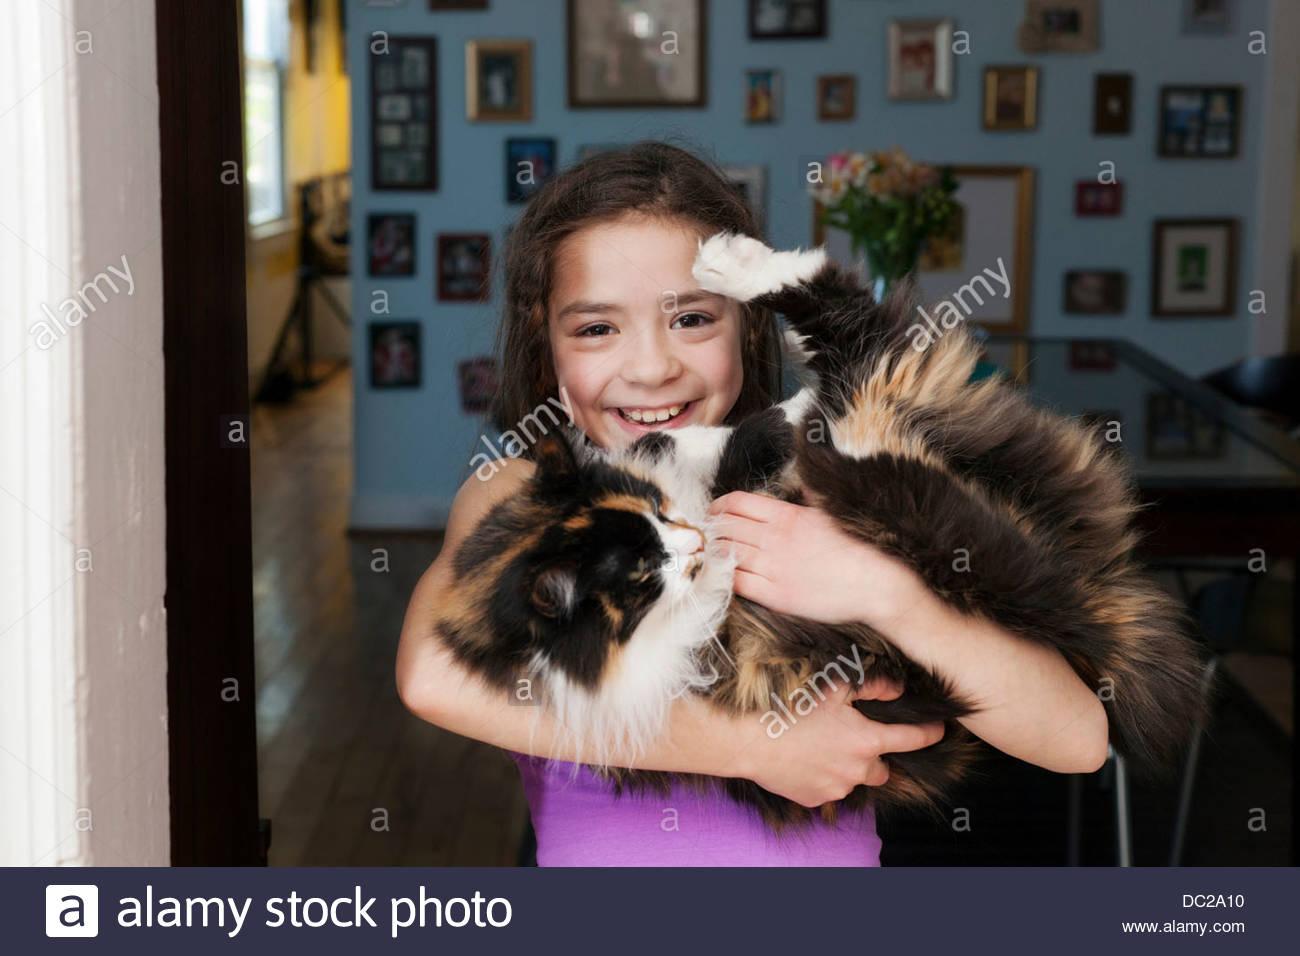 Girl holding pet cat - Stock Image